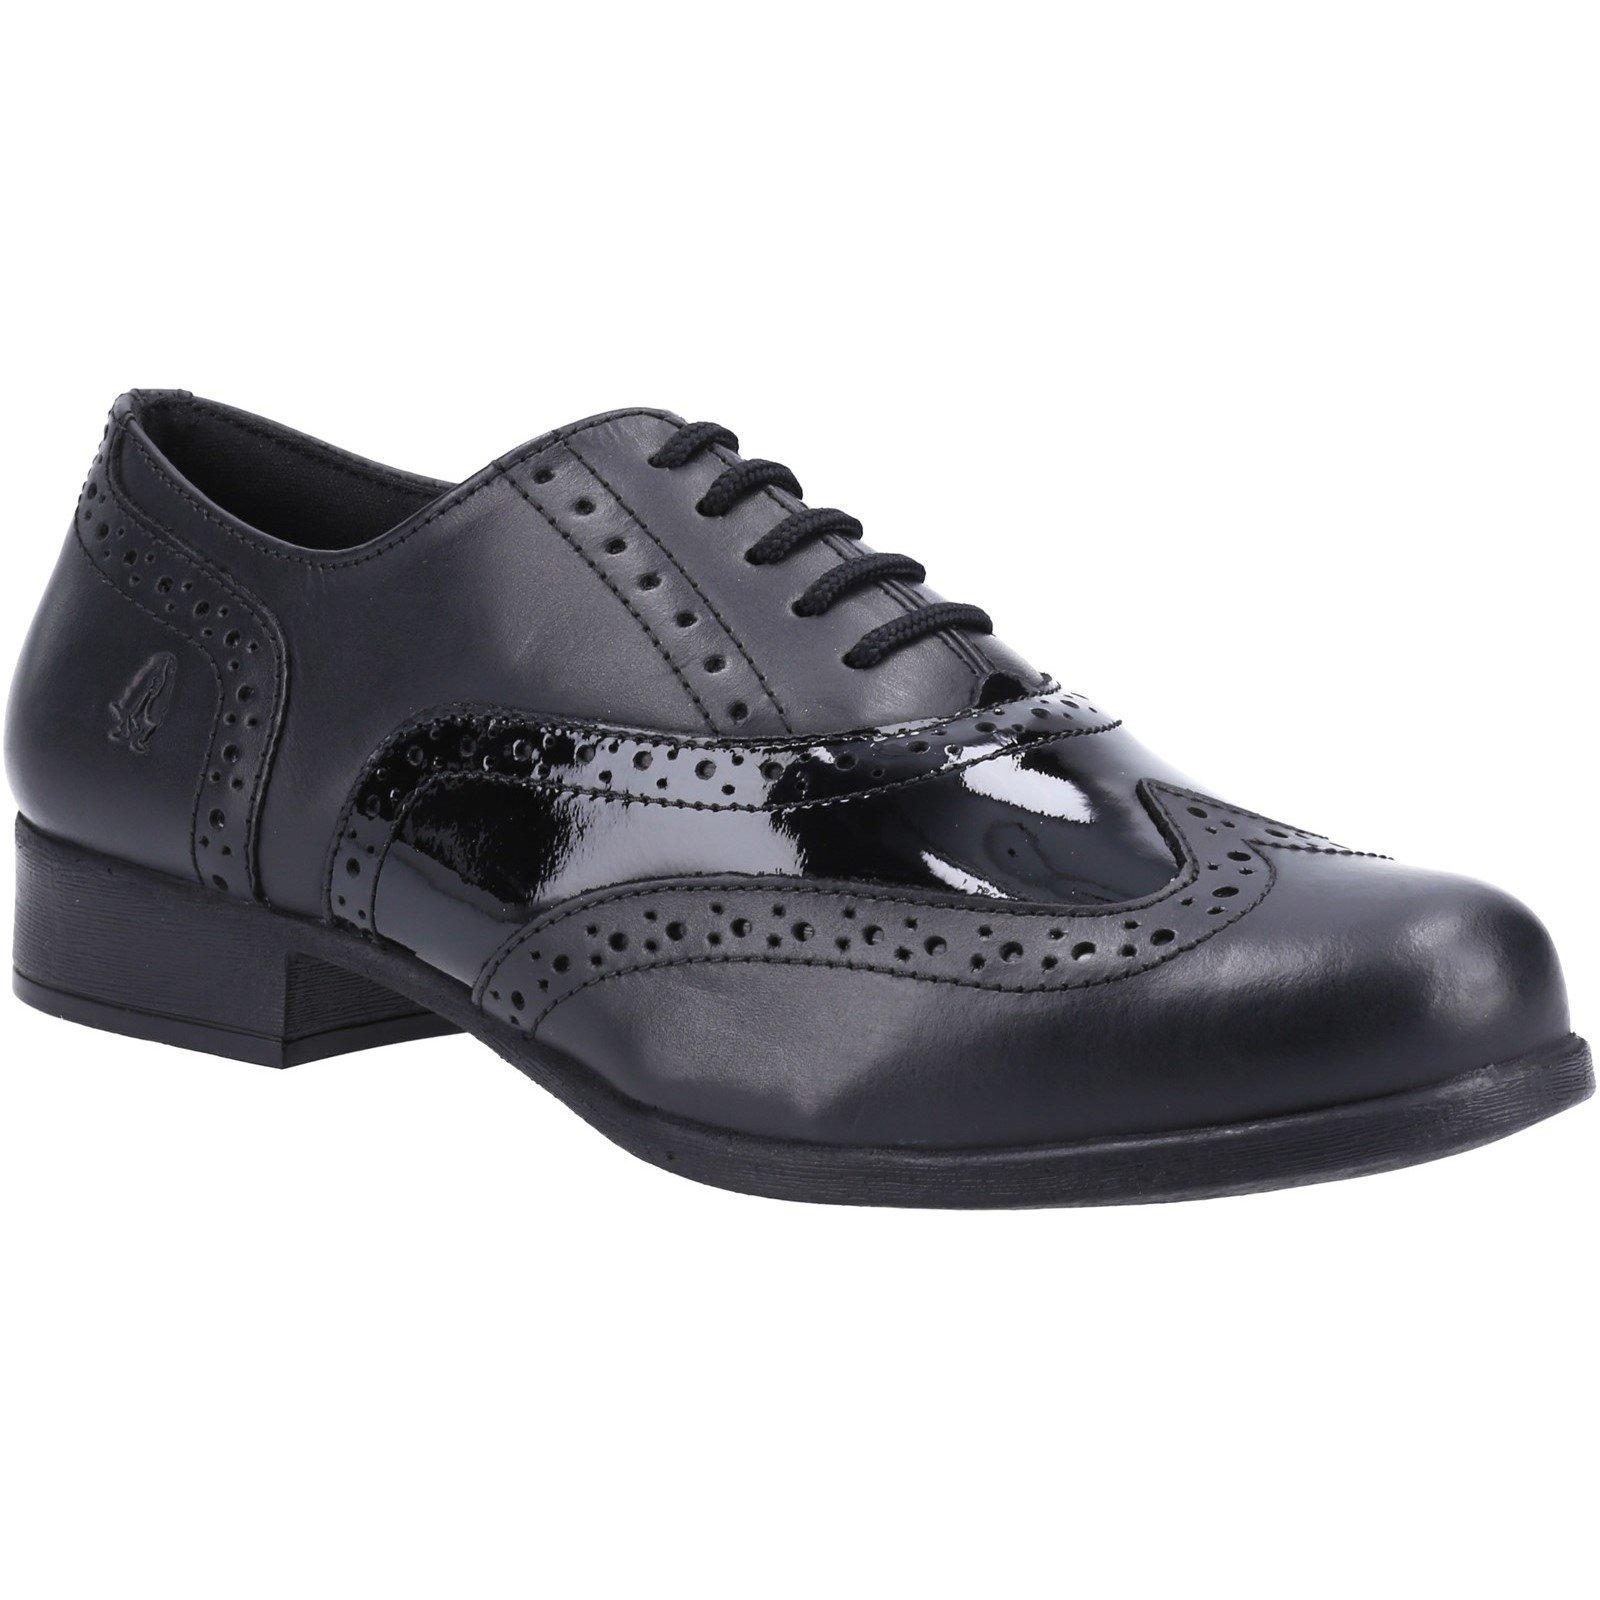 Hush Puppies Kid's Kada Junior School Brogue Shoe Black 33192 - Black 2